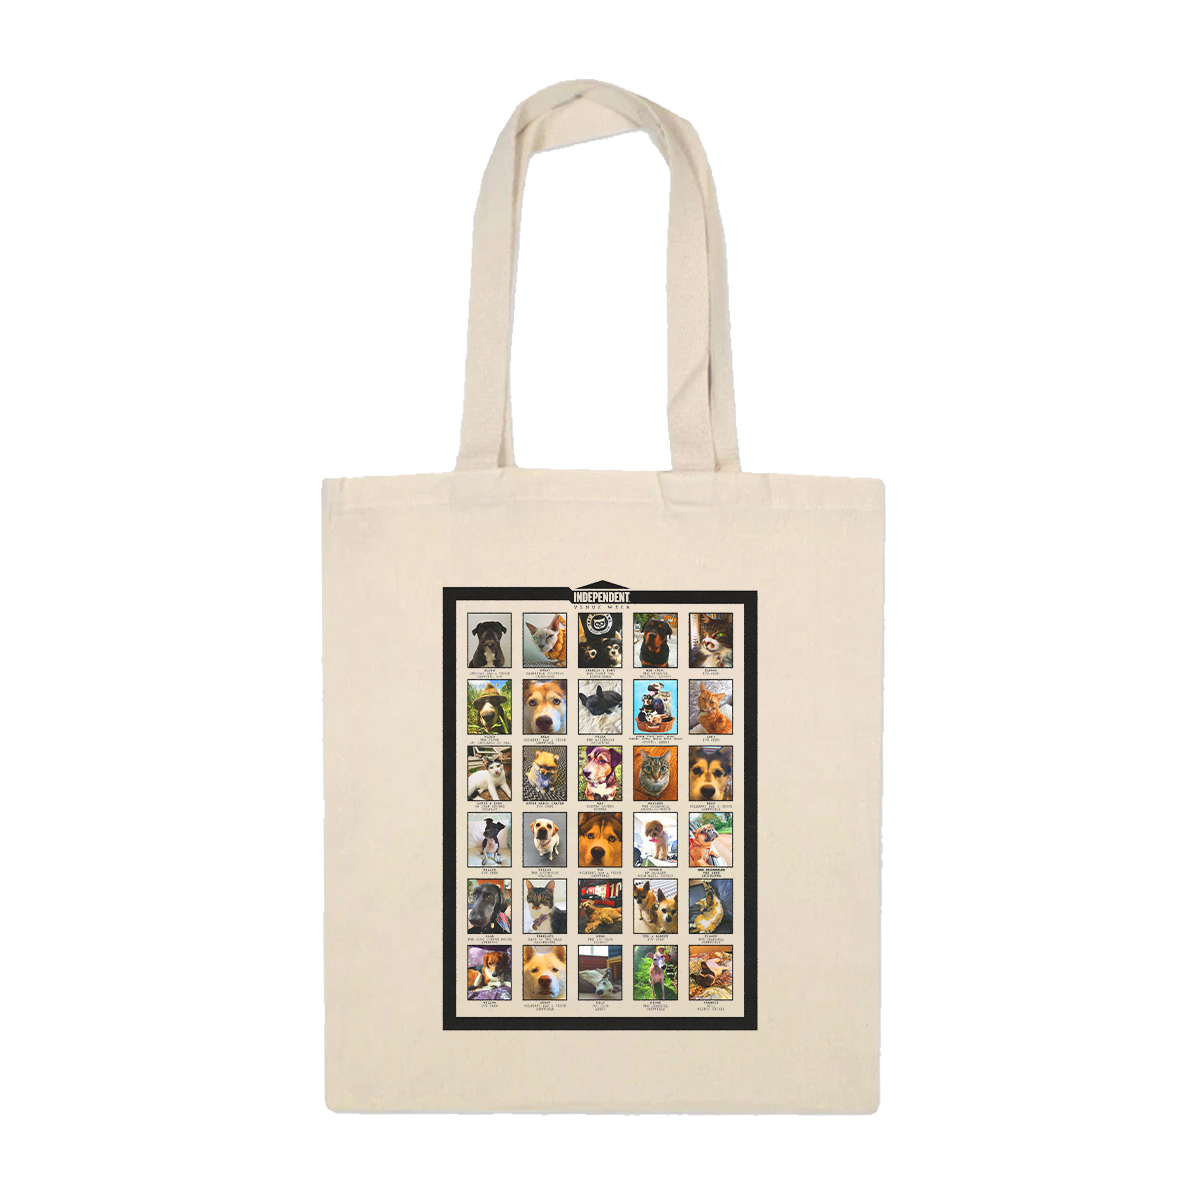 IVW Pets Tote Bag (Natural)